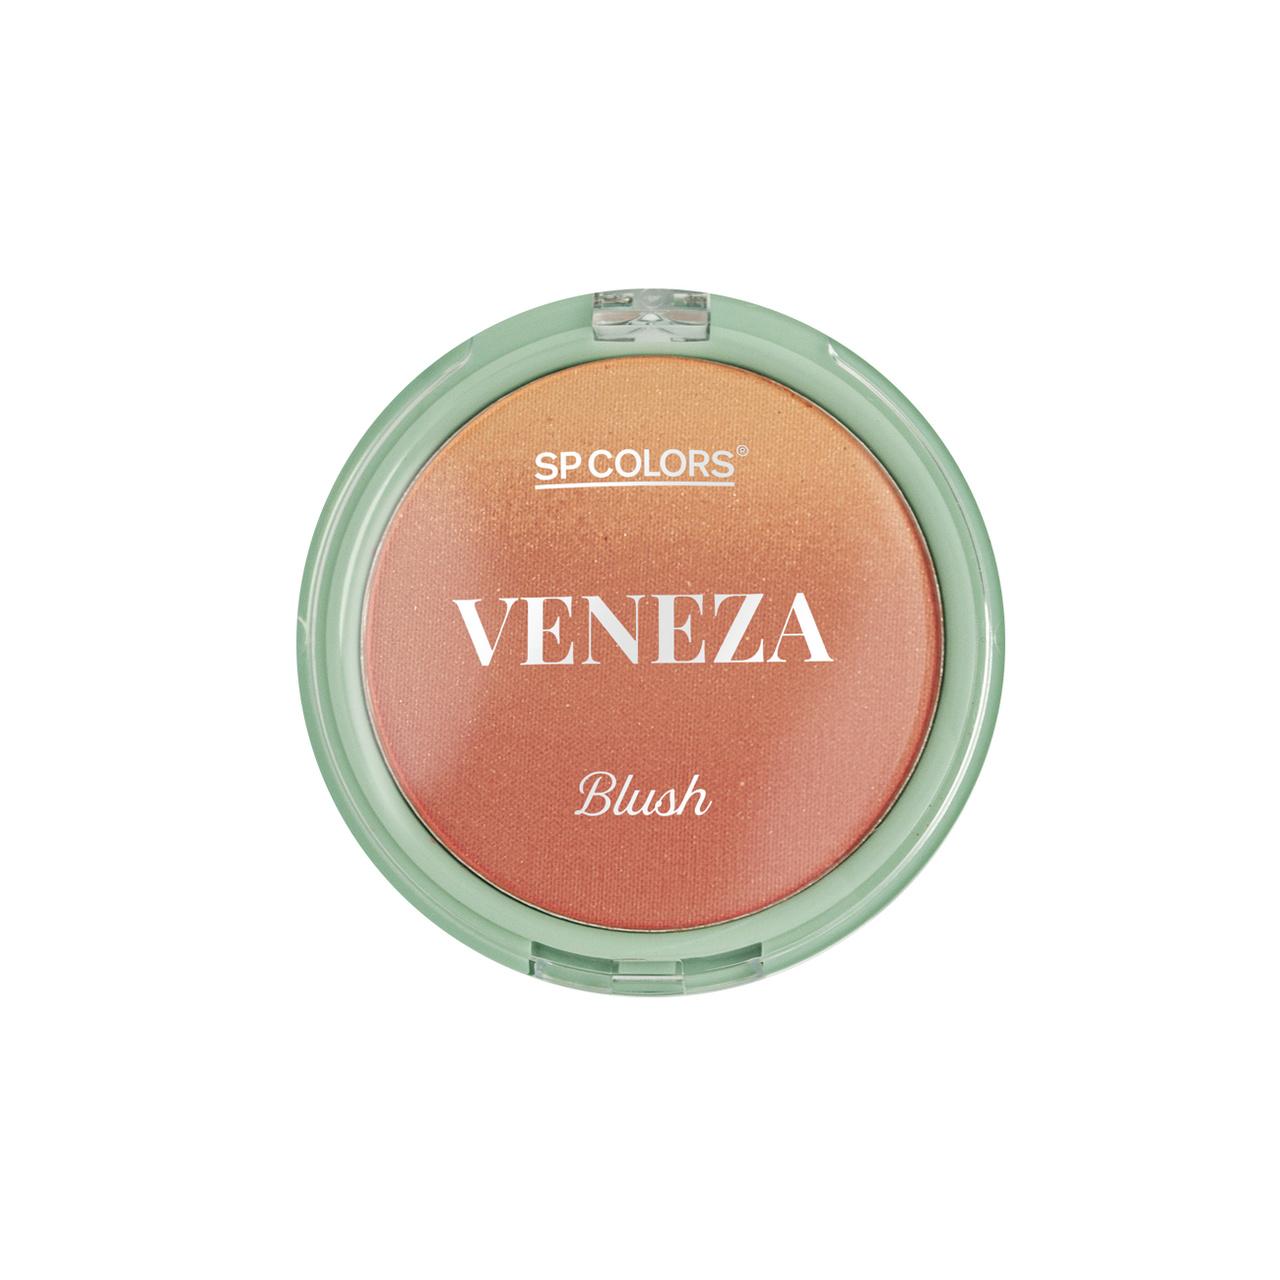 Blush Facial Veneza SP Colors